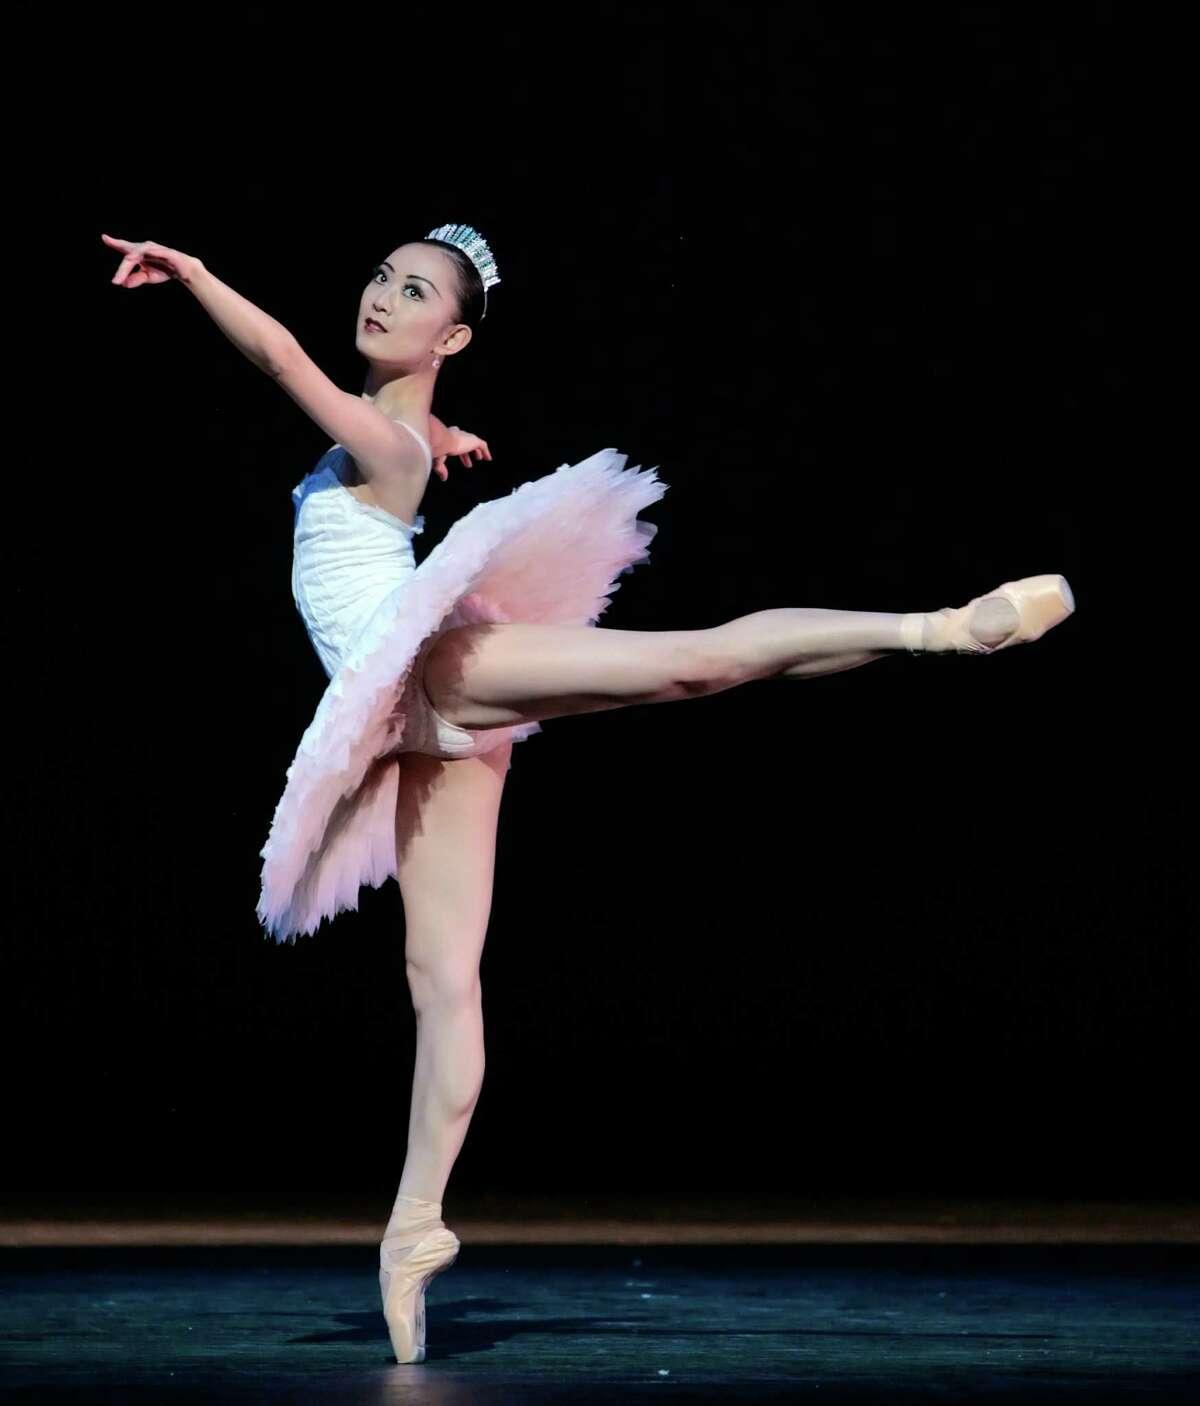 Houston Ballet soloist Nao Kusuzaki co-created and will star in